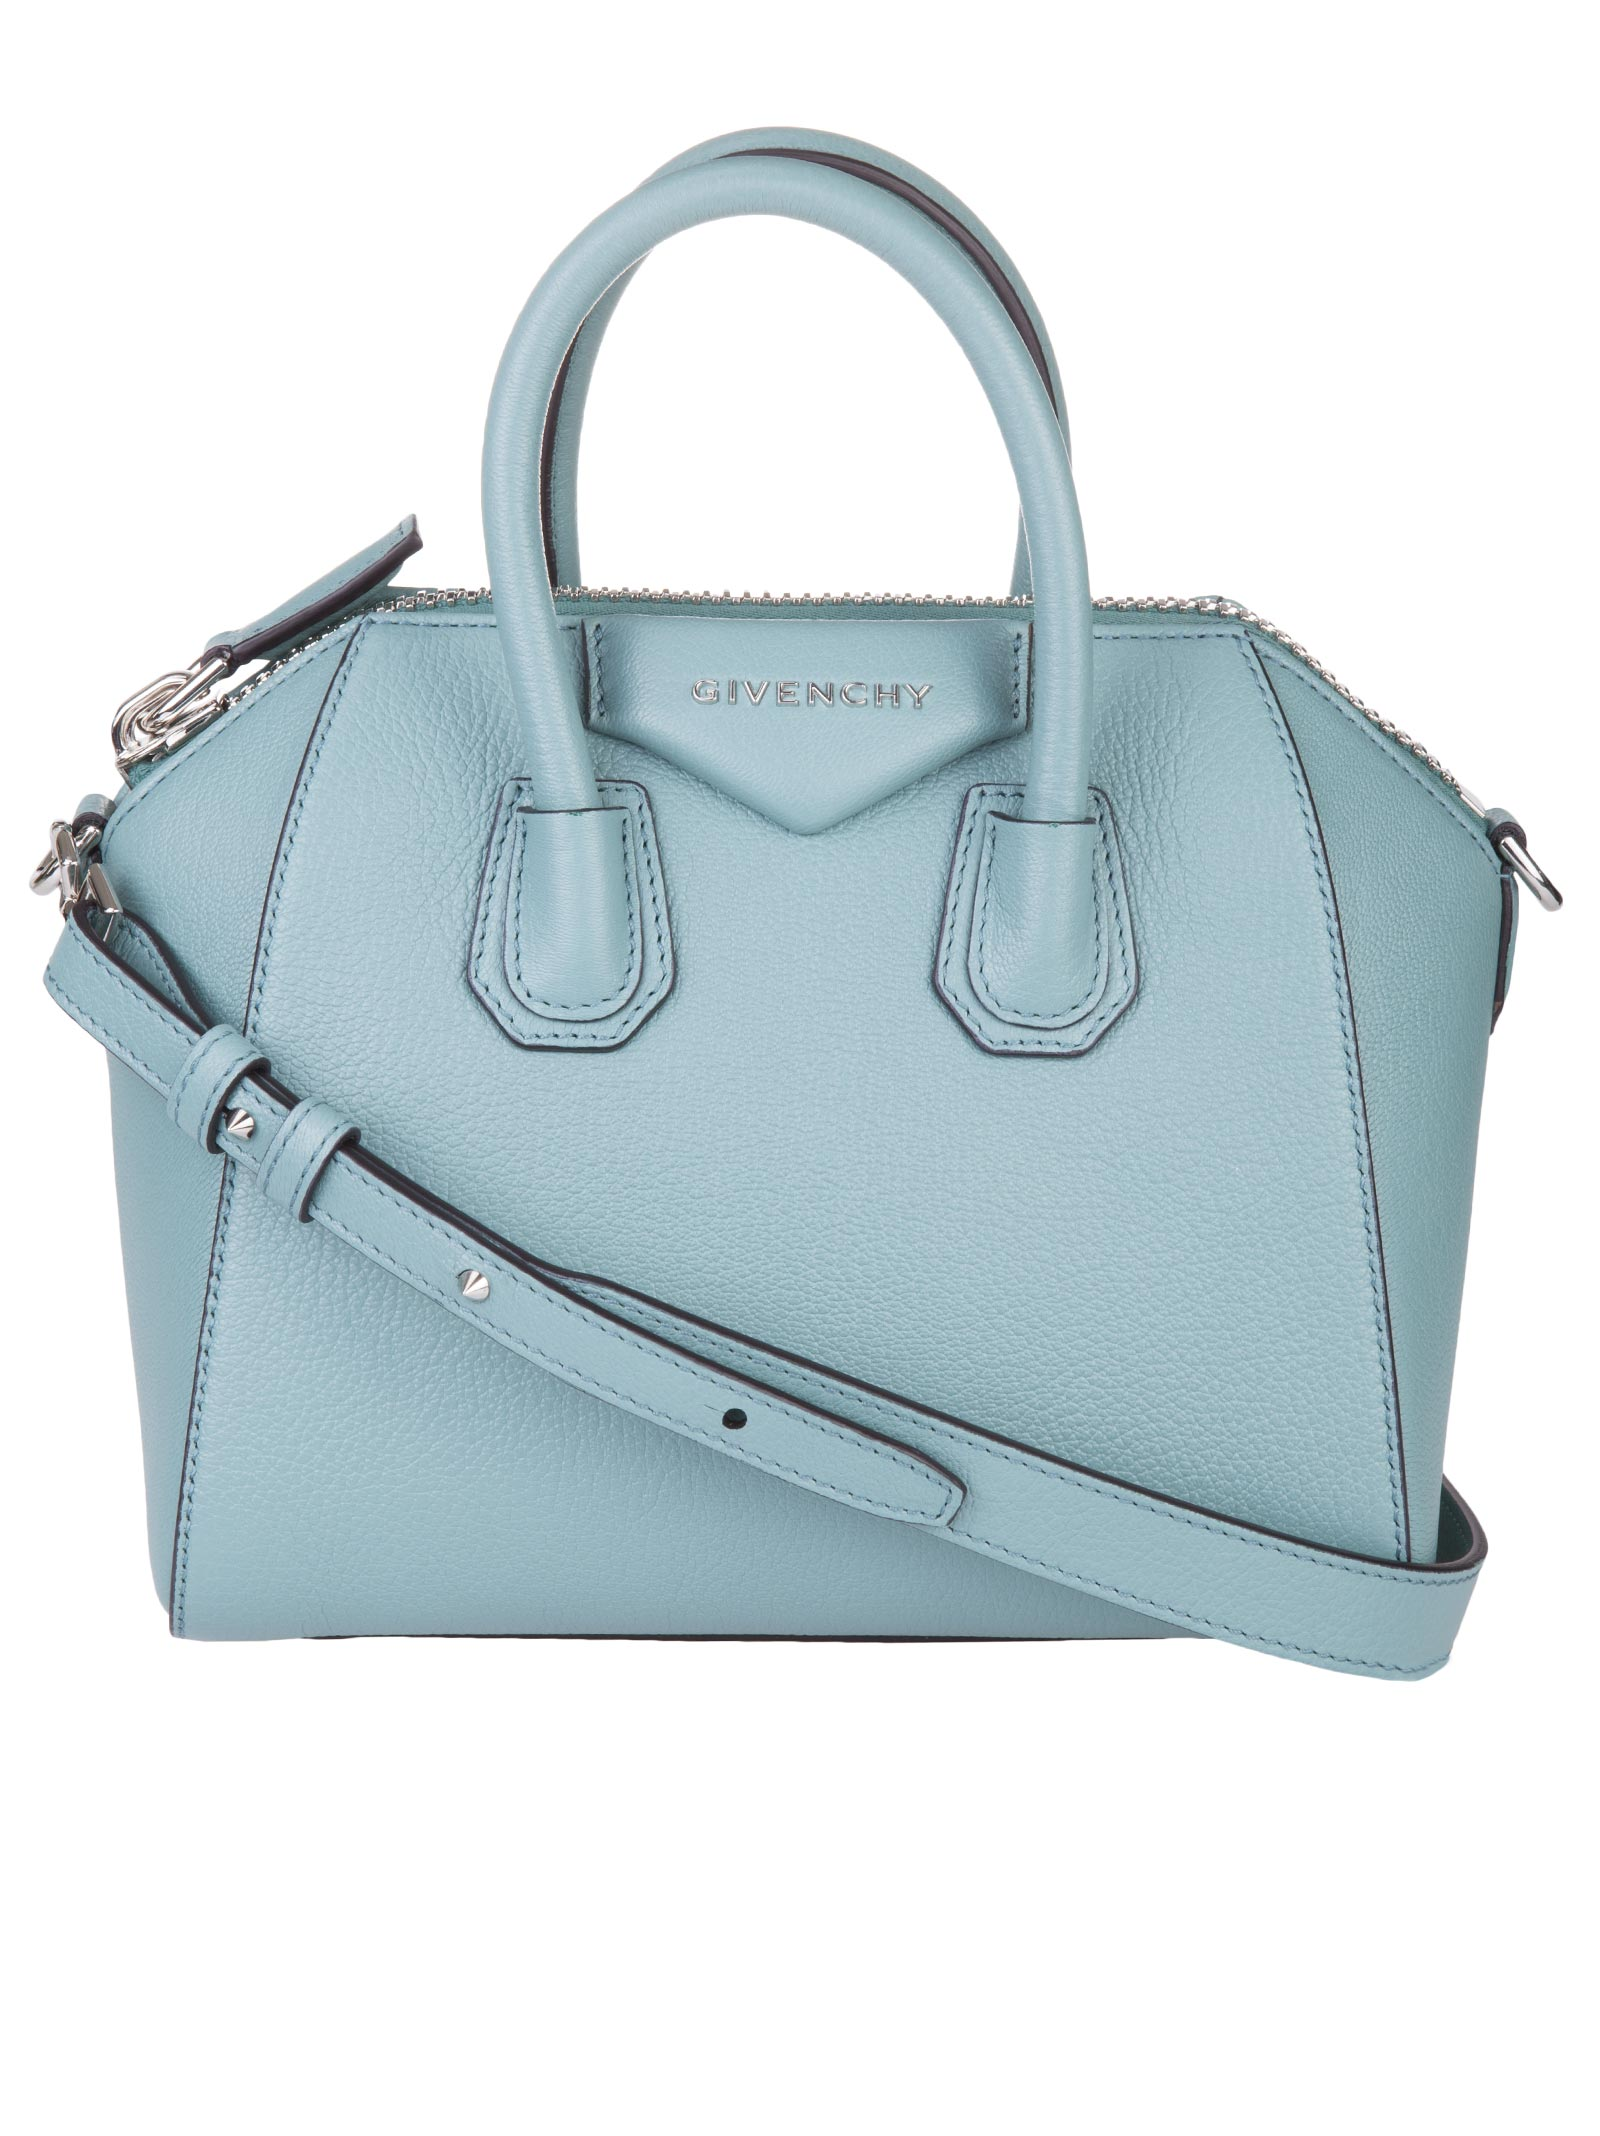 728c889ba1 Givenchy tote bag - Givenchy - Michele Franzese Moda